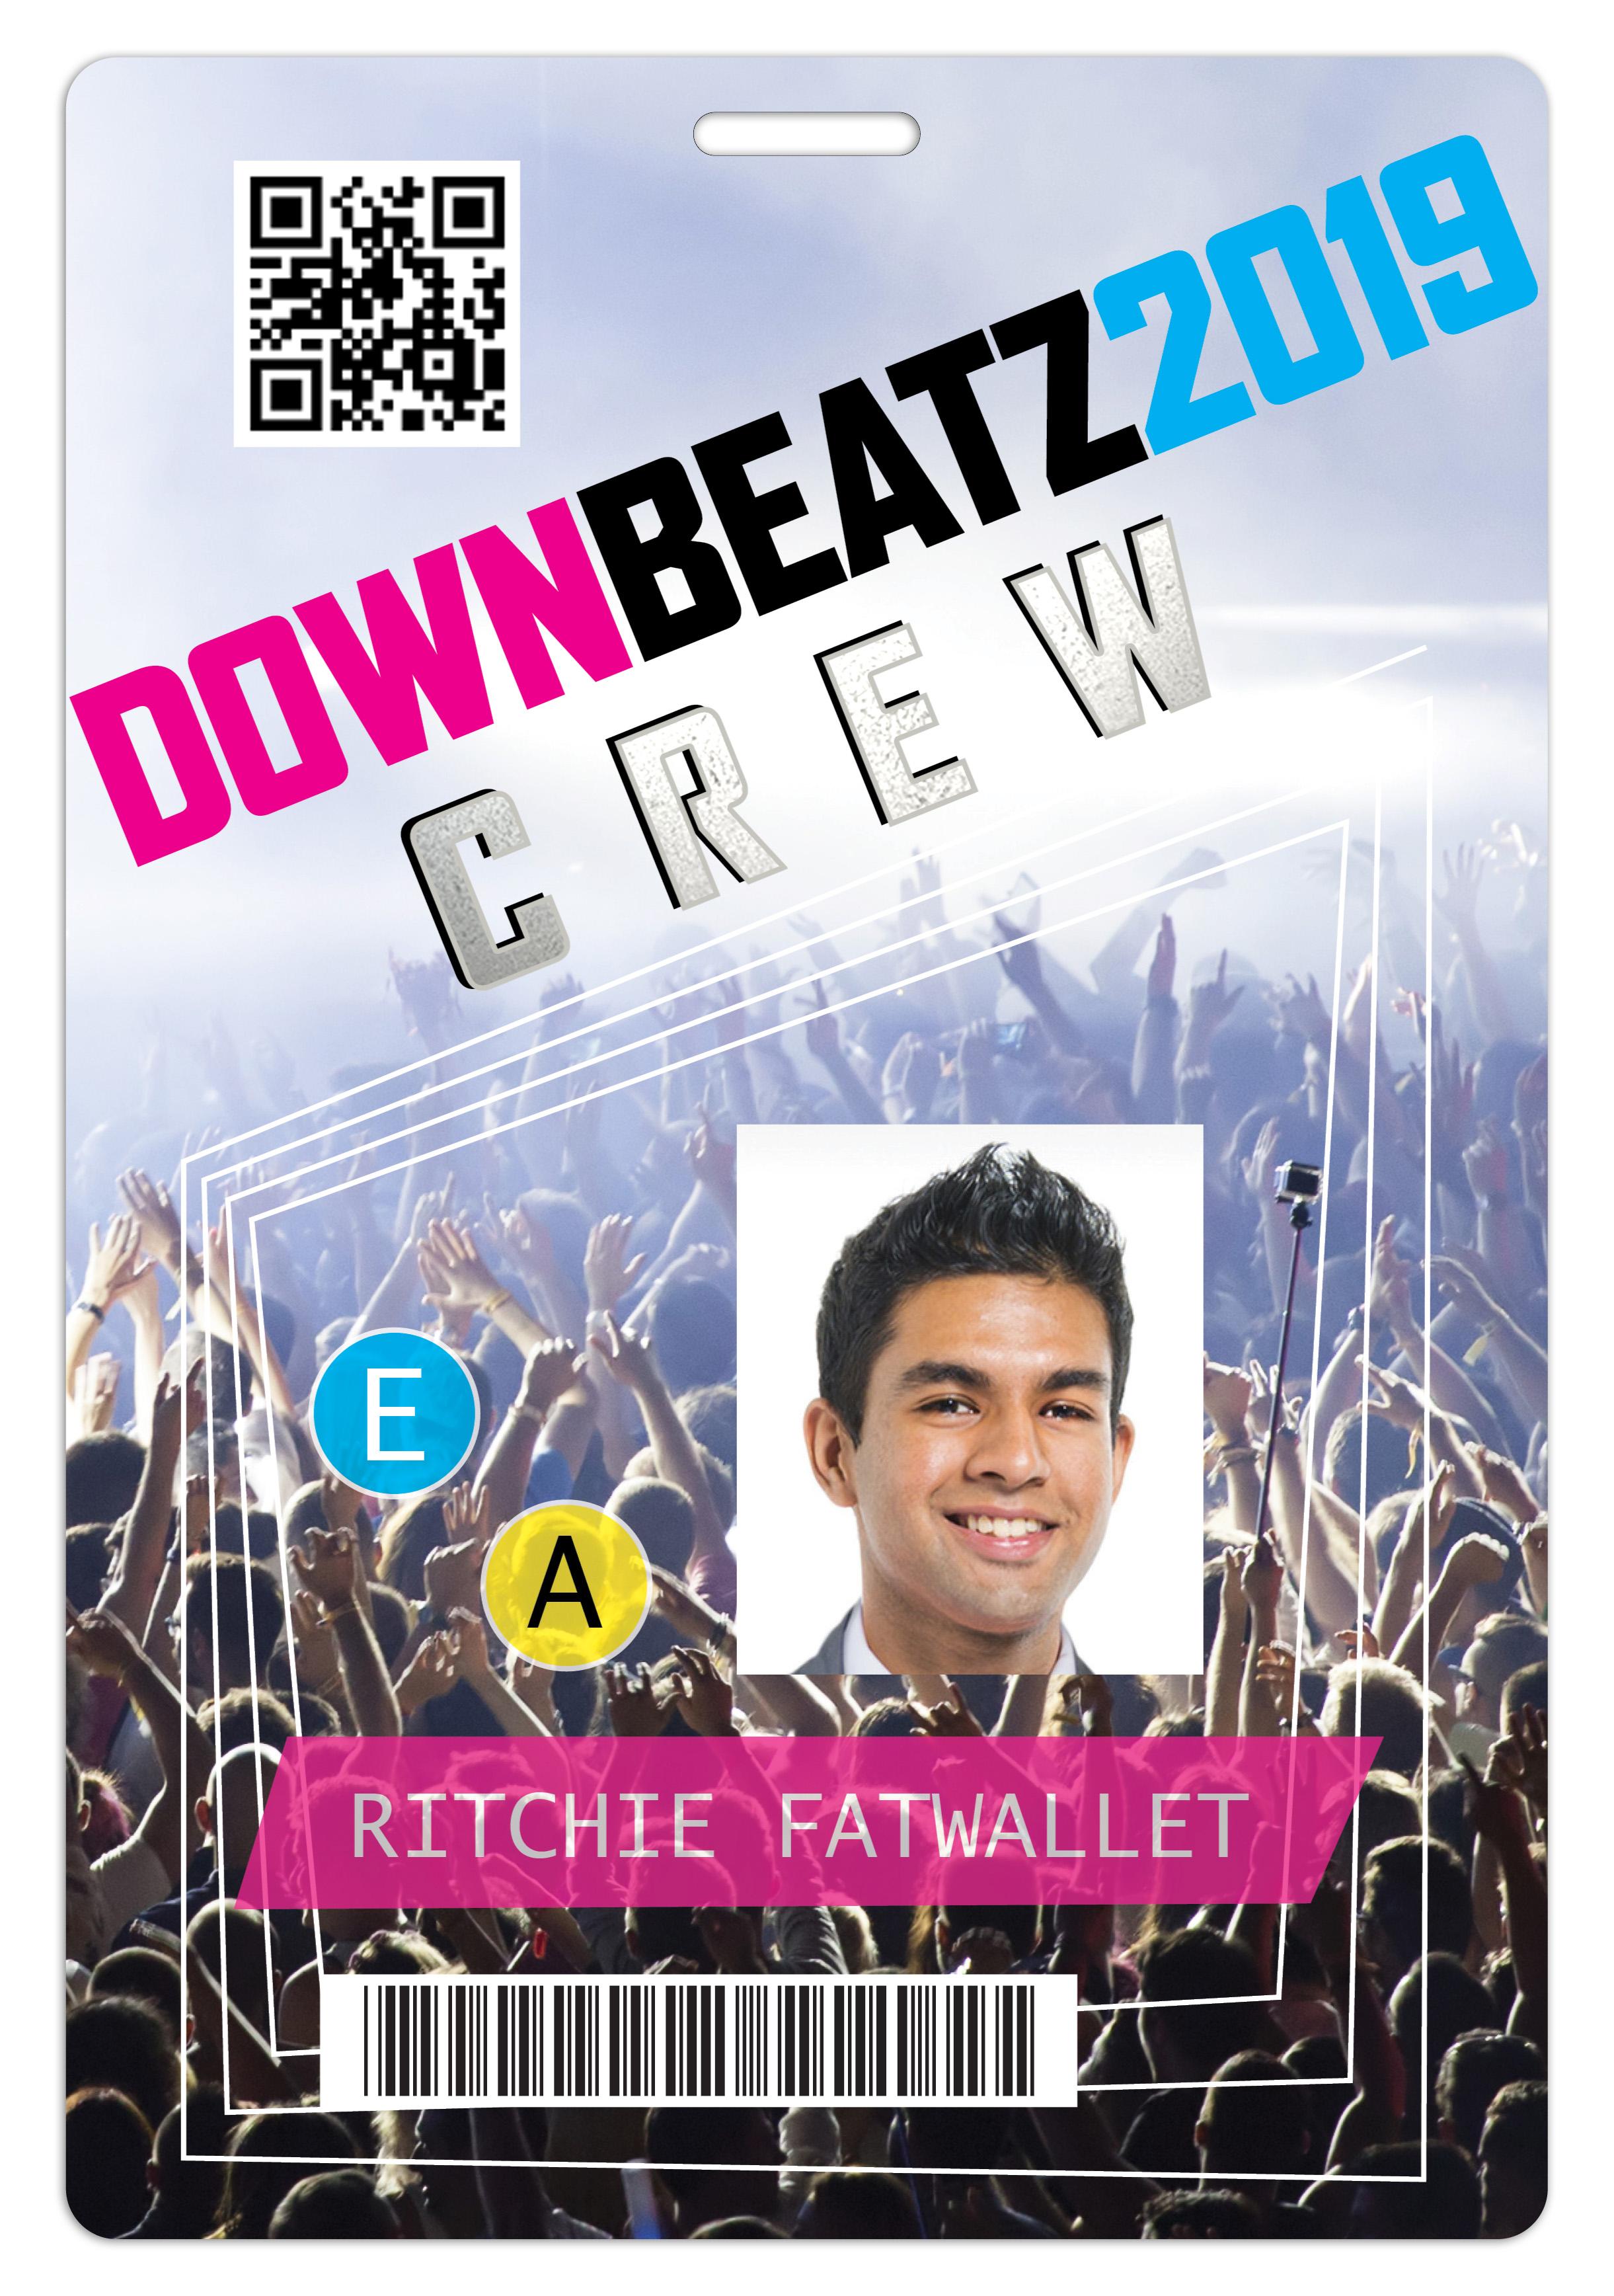 card_sample_DOWNBEATZ_cut-01_final_idshop